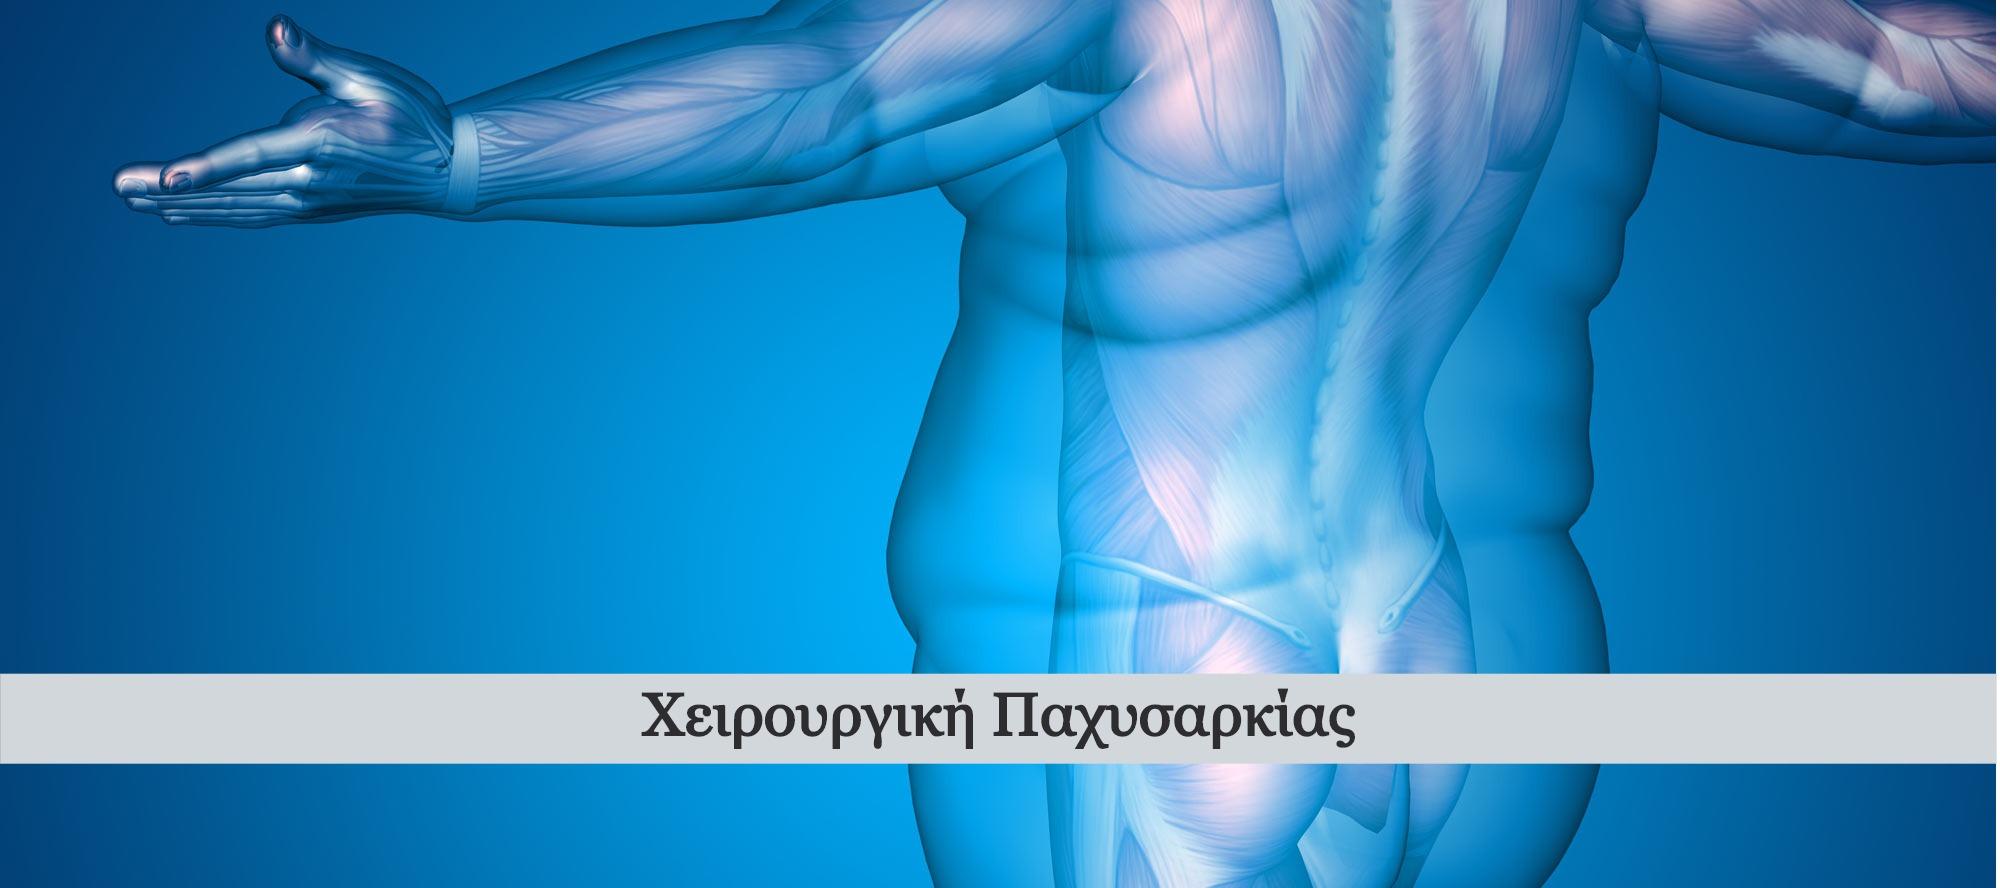 laparoskopikes-epemvaseis-pachysarkias_e